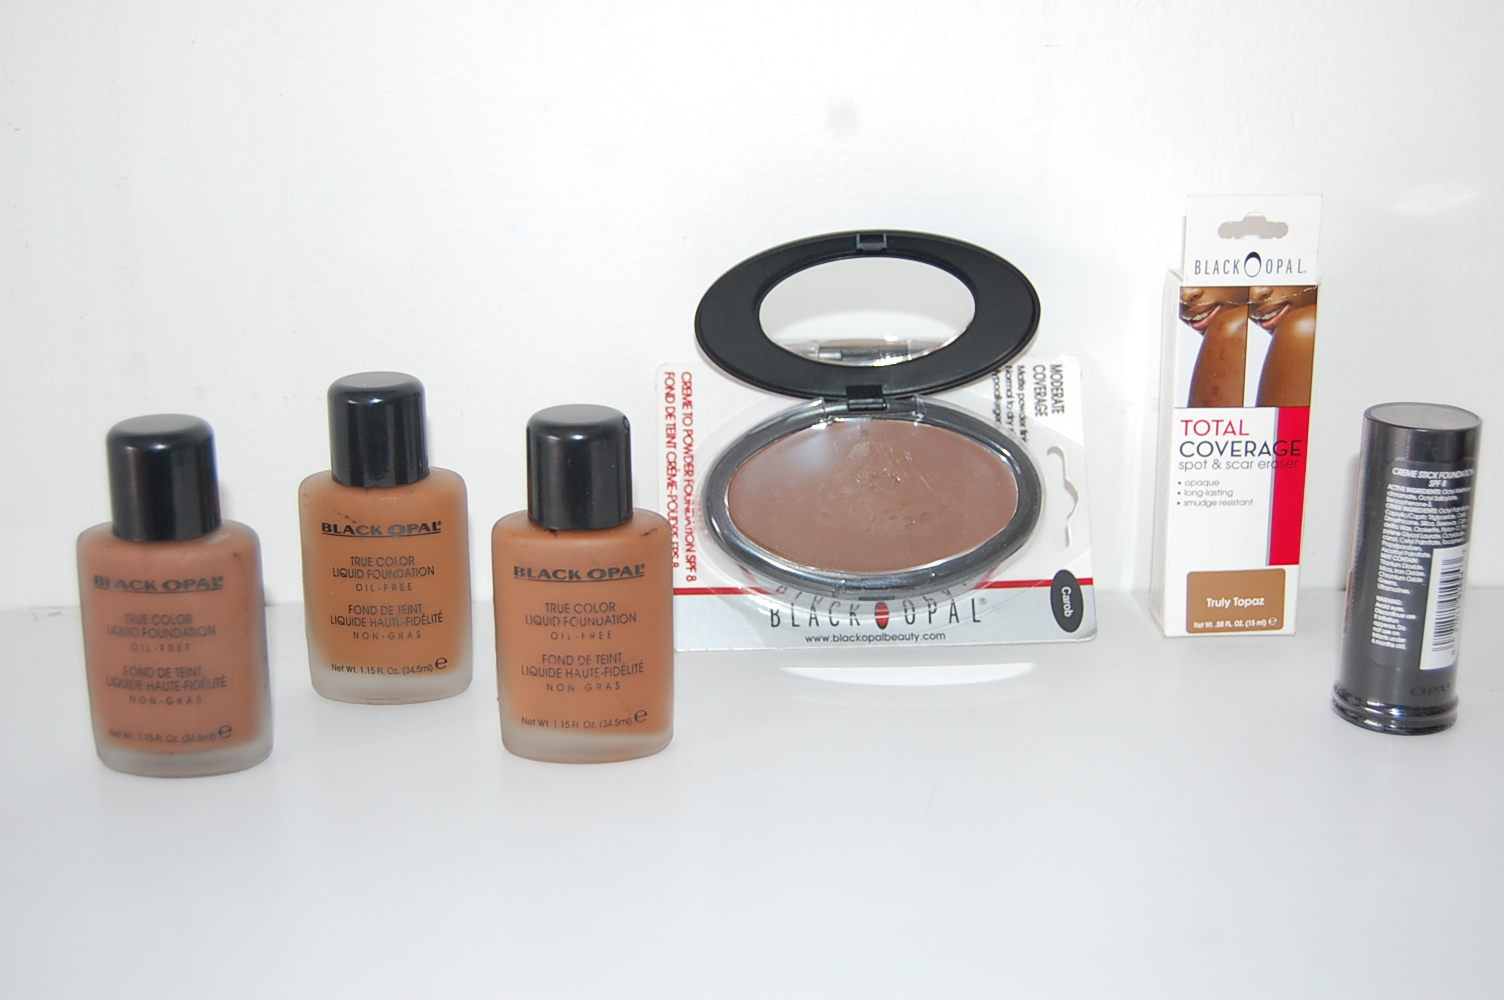 Black Opal Make Up Range Skin Solutions Tanzania